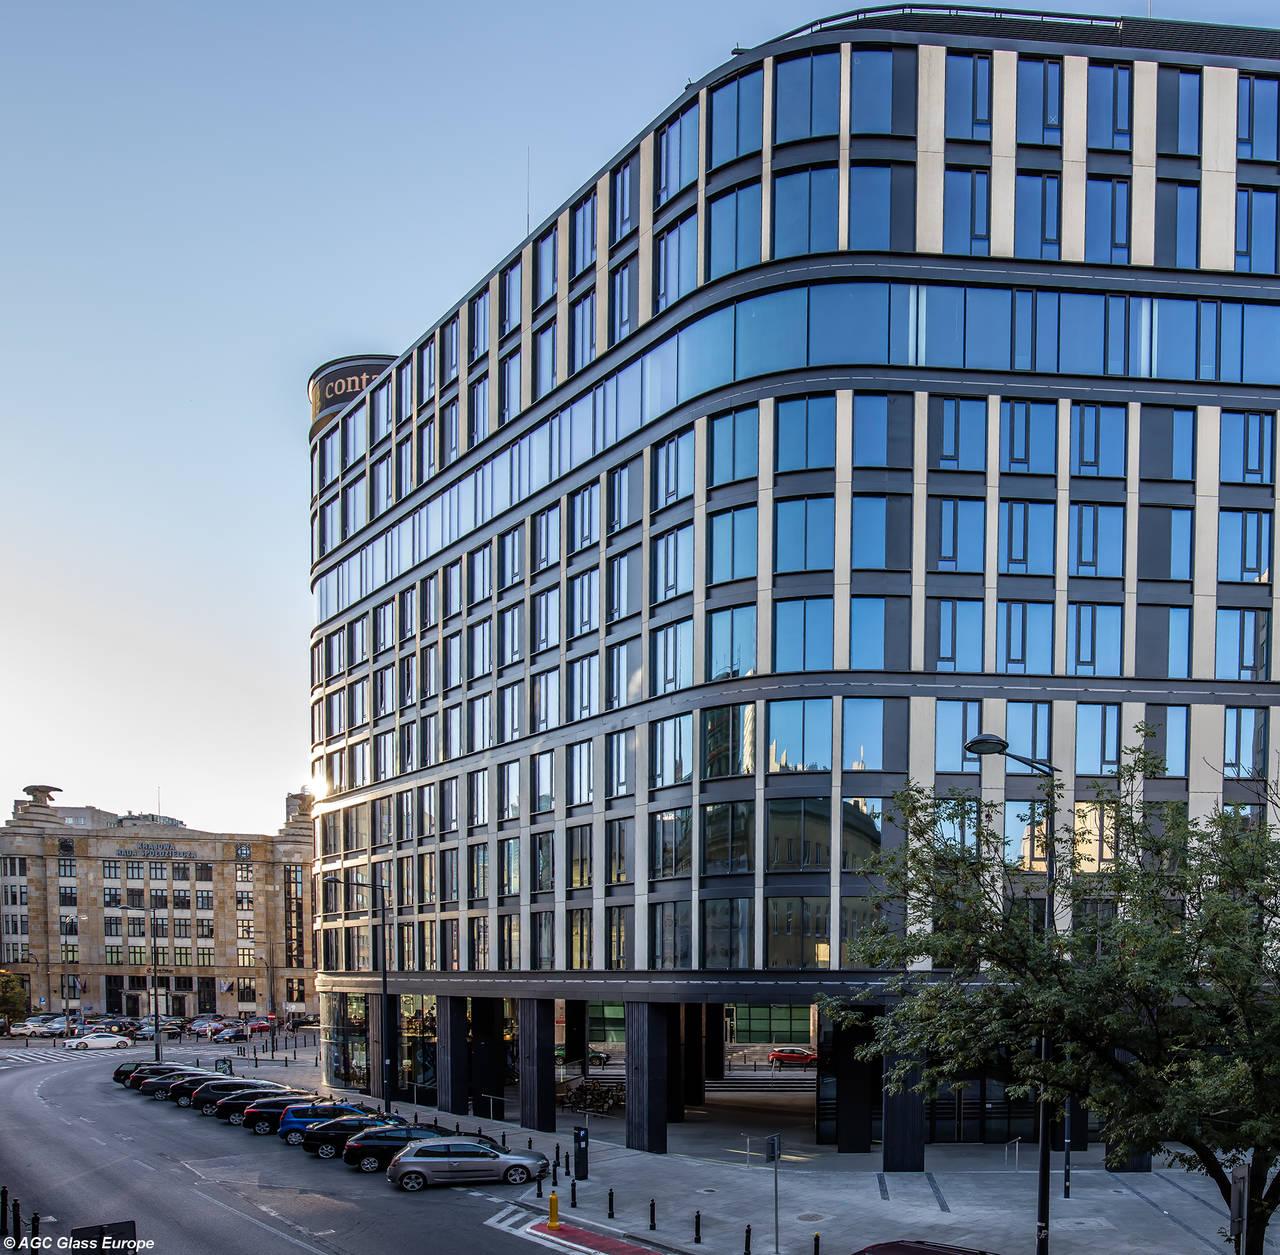 Astoria Building sito nel centro di Varsavia, Polonia, progettato da Epstein / Biuro Projektów Kazimierski I Ryba Sp. j.